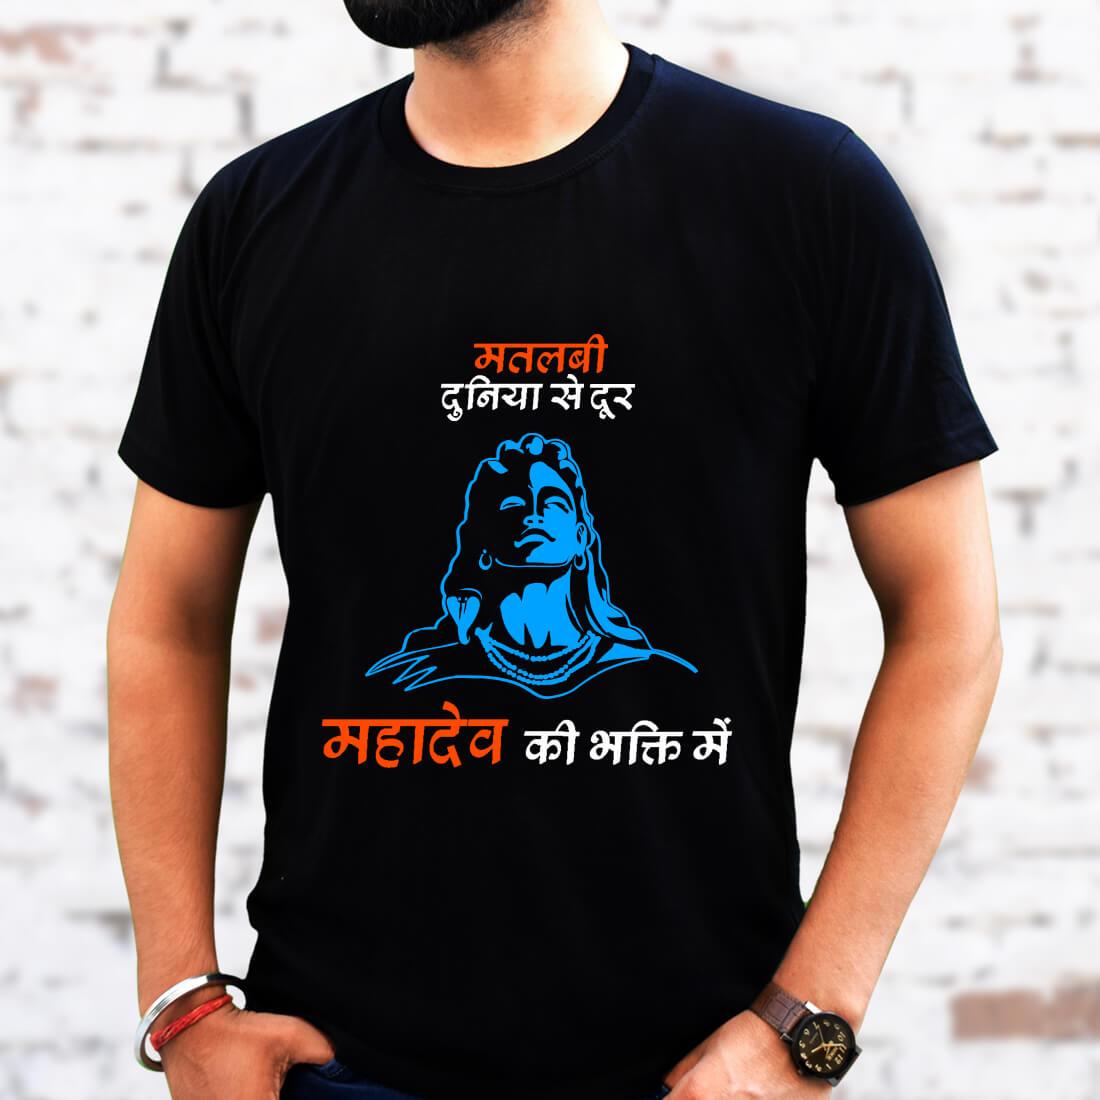 Mahadev Quotes on Life Printed Black T Shirt Men